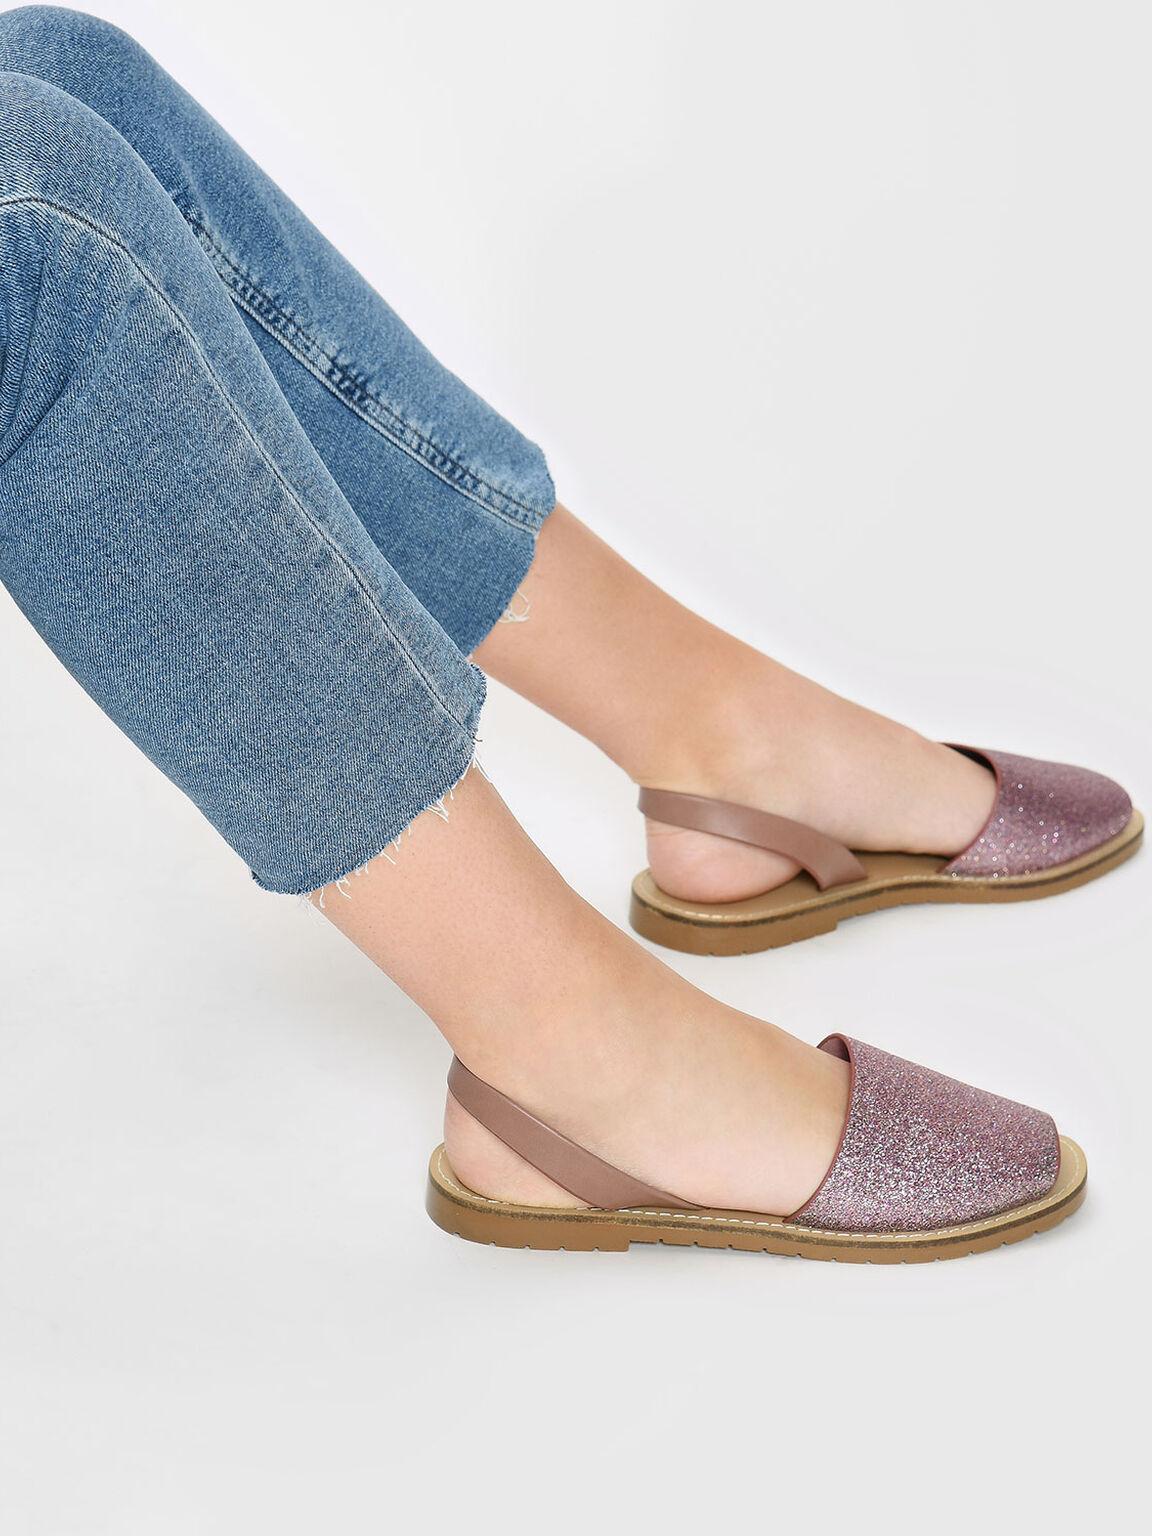 Glittery Slingback Sandals, Nude, hi-res